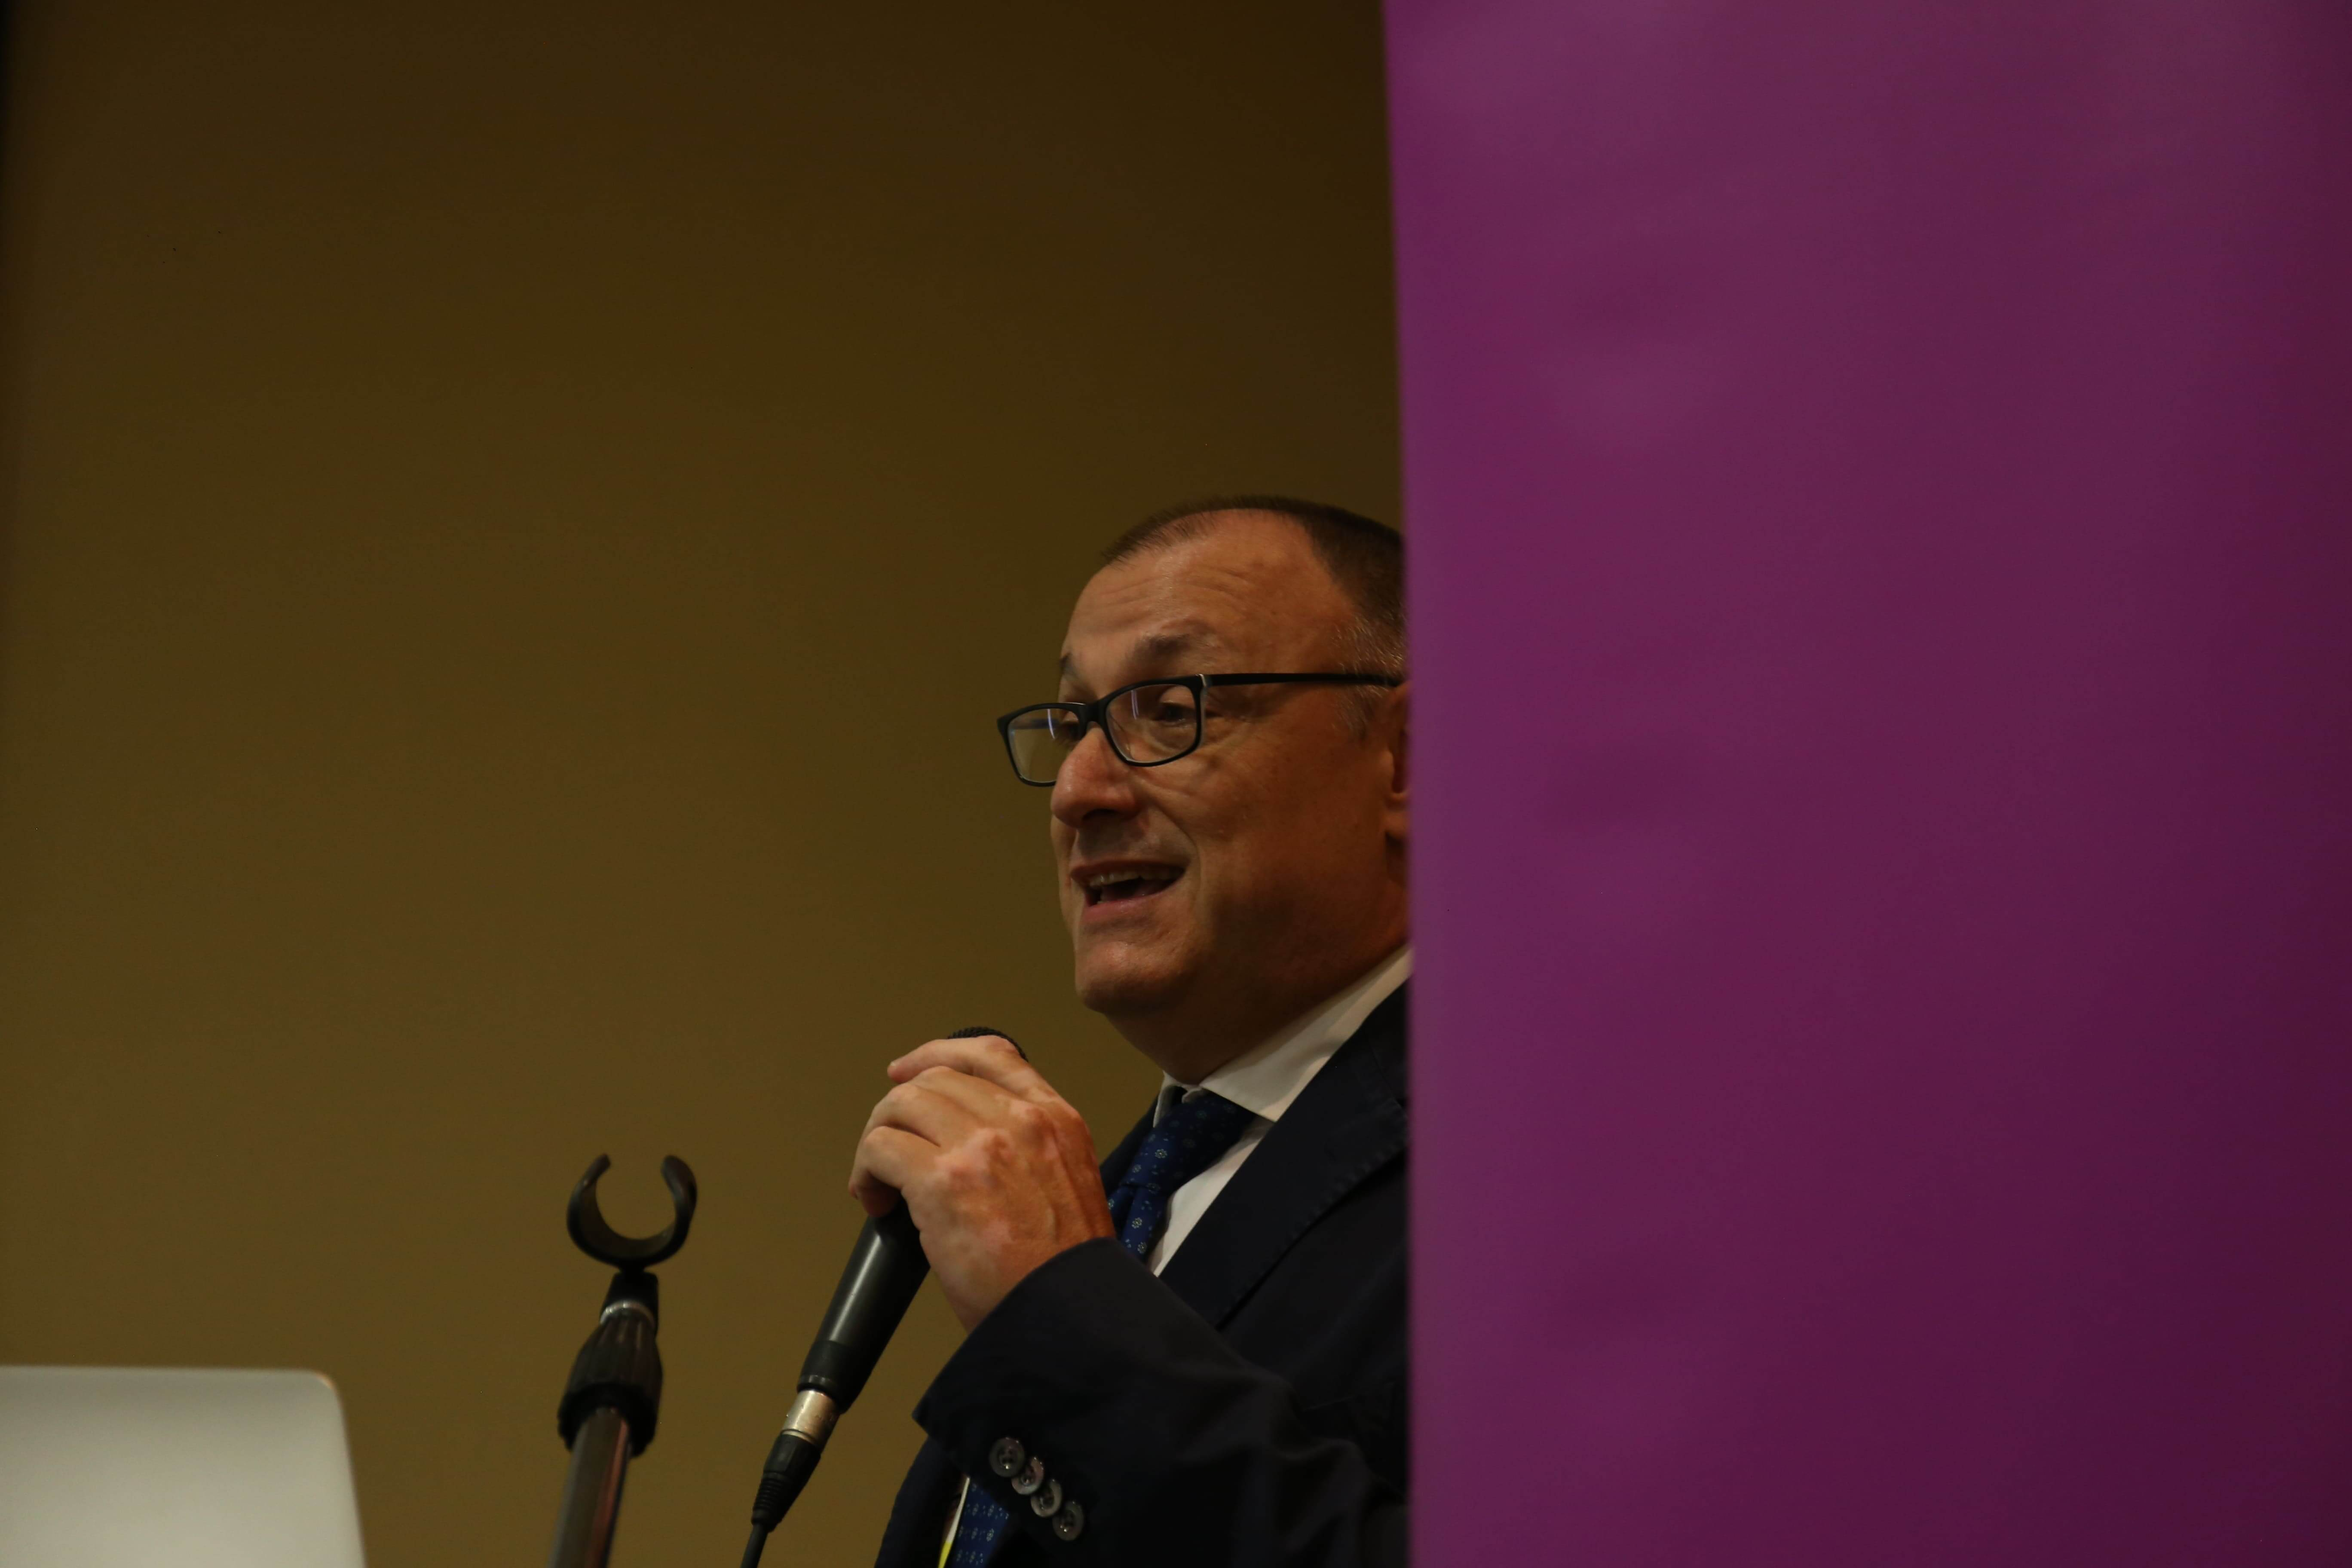 Cancer conference - Francesco Izzo